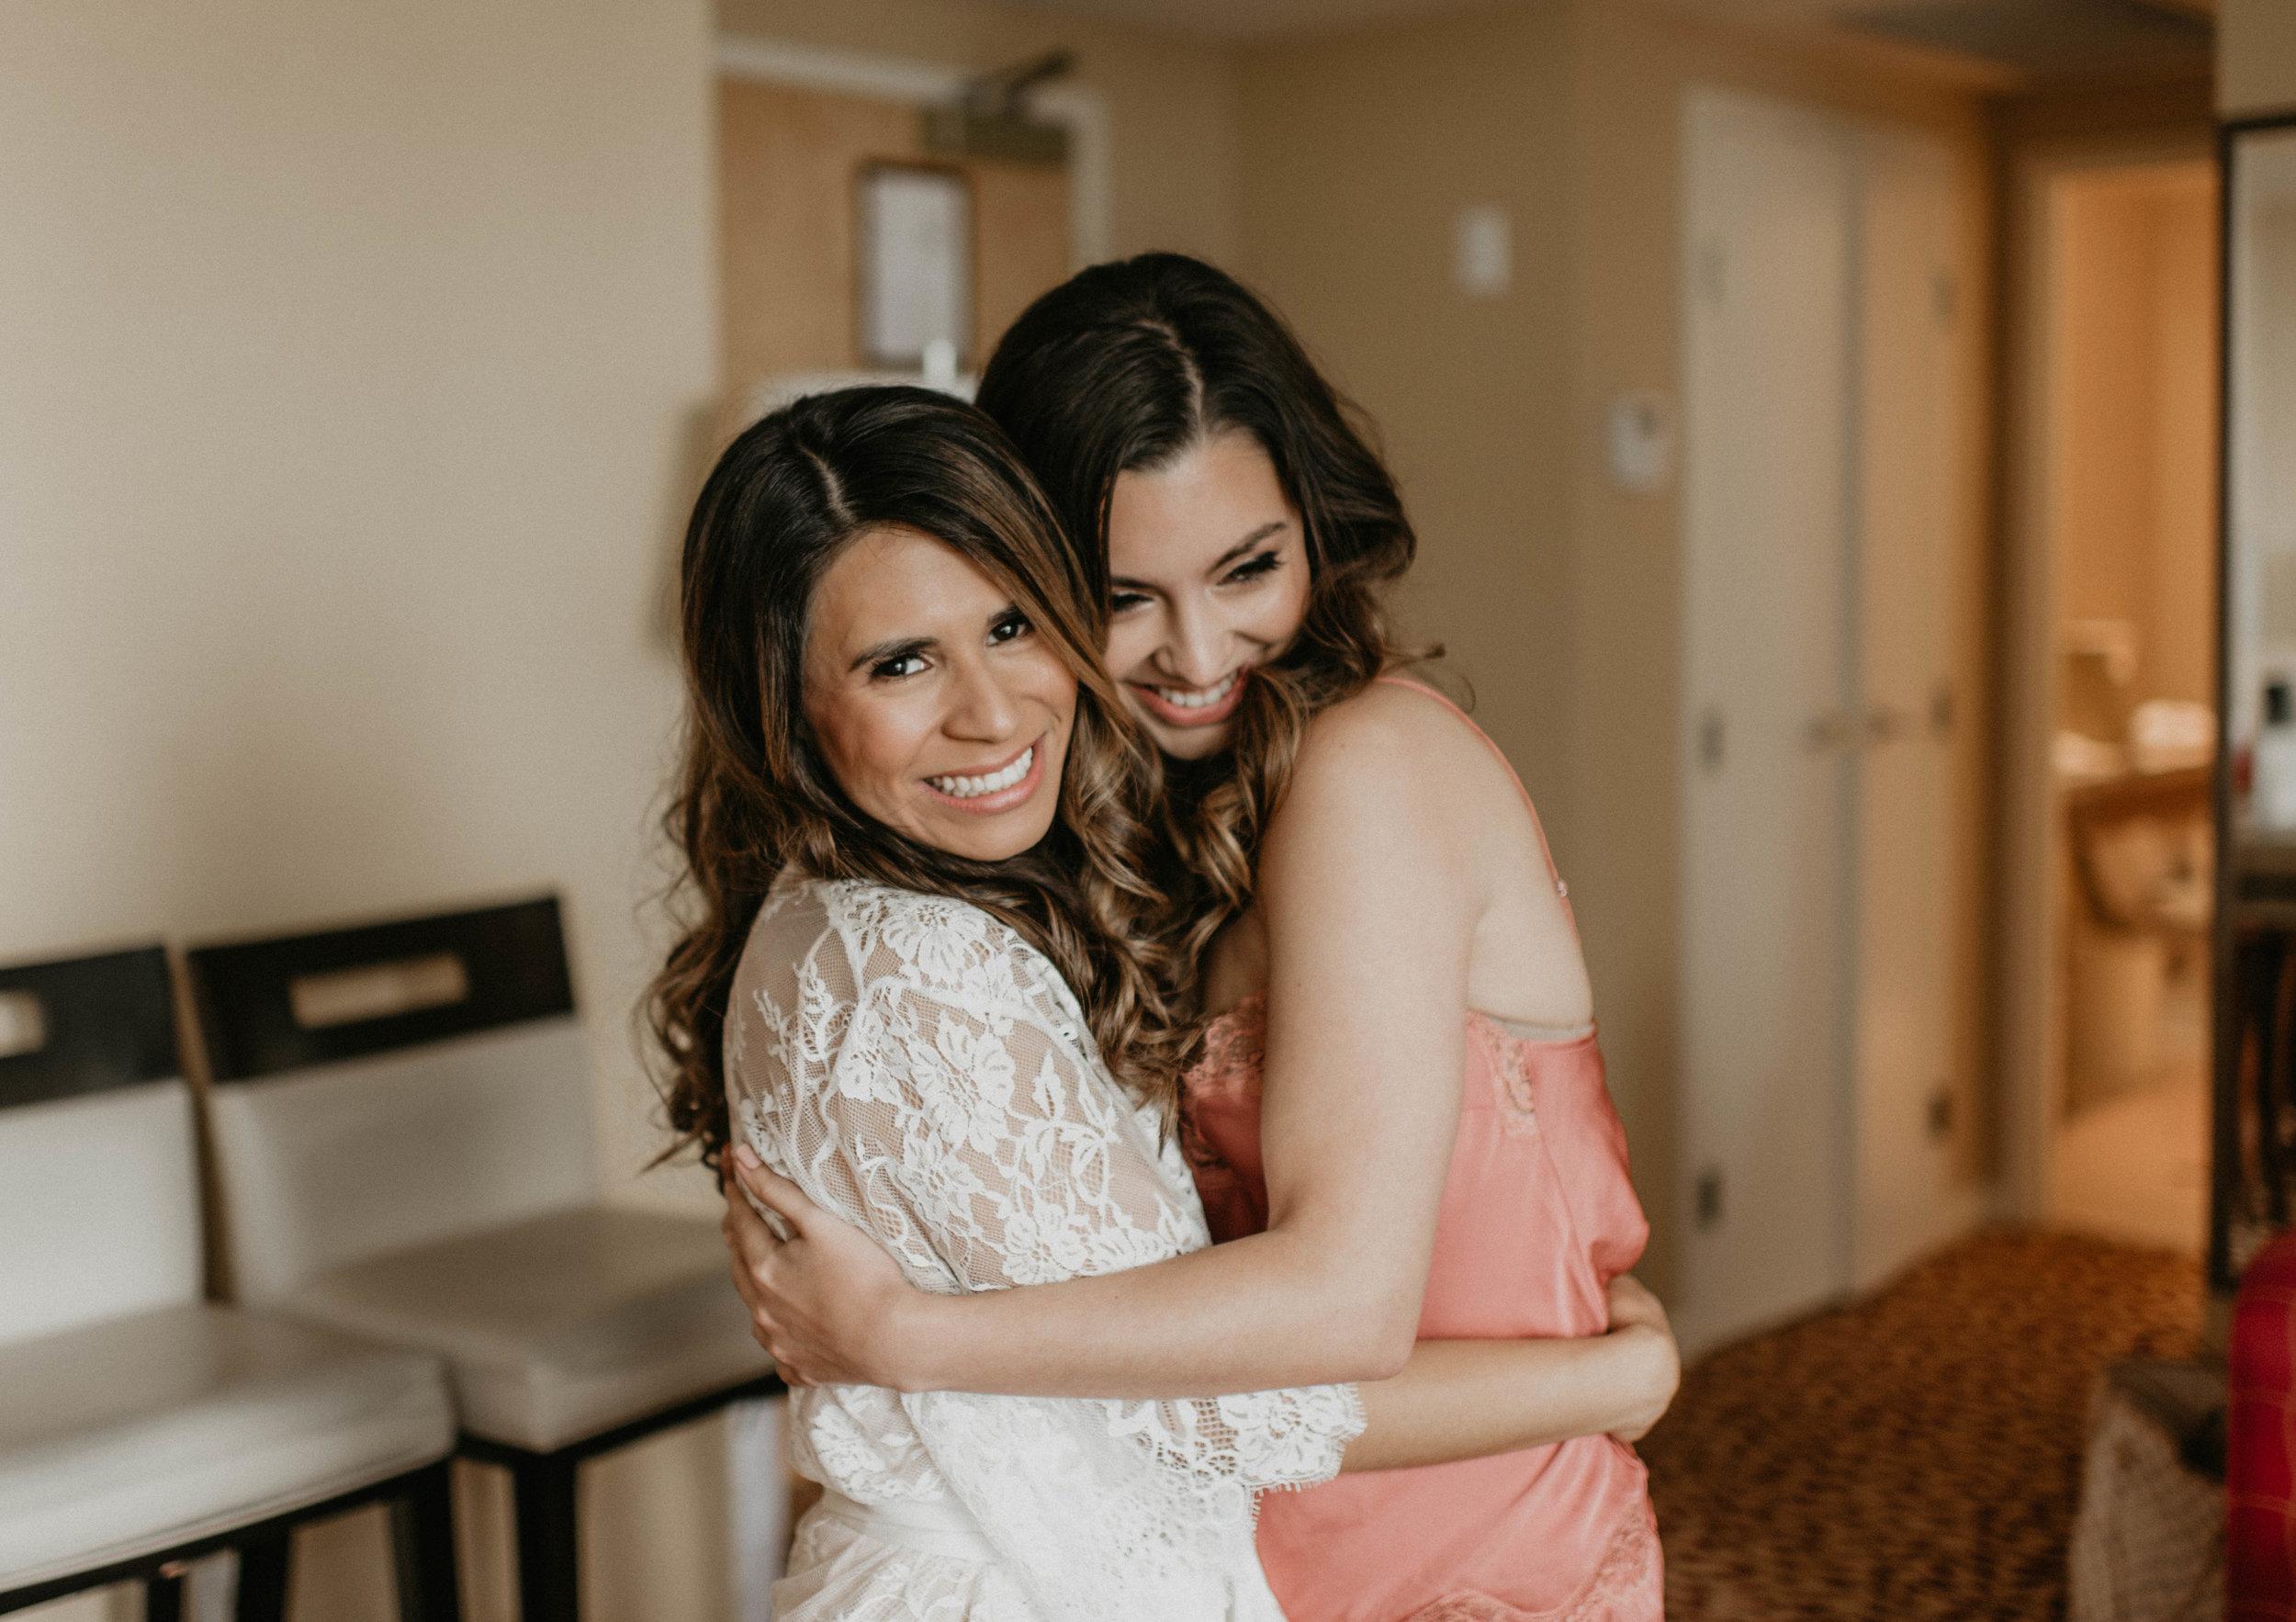 austin-texas-wedding-photography-1778-photographie-5.jpg